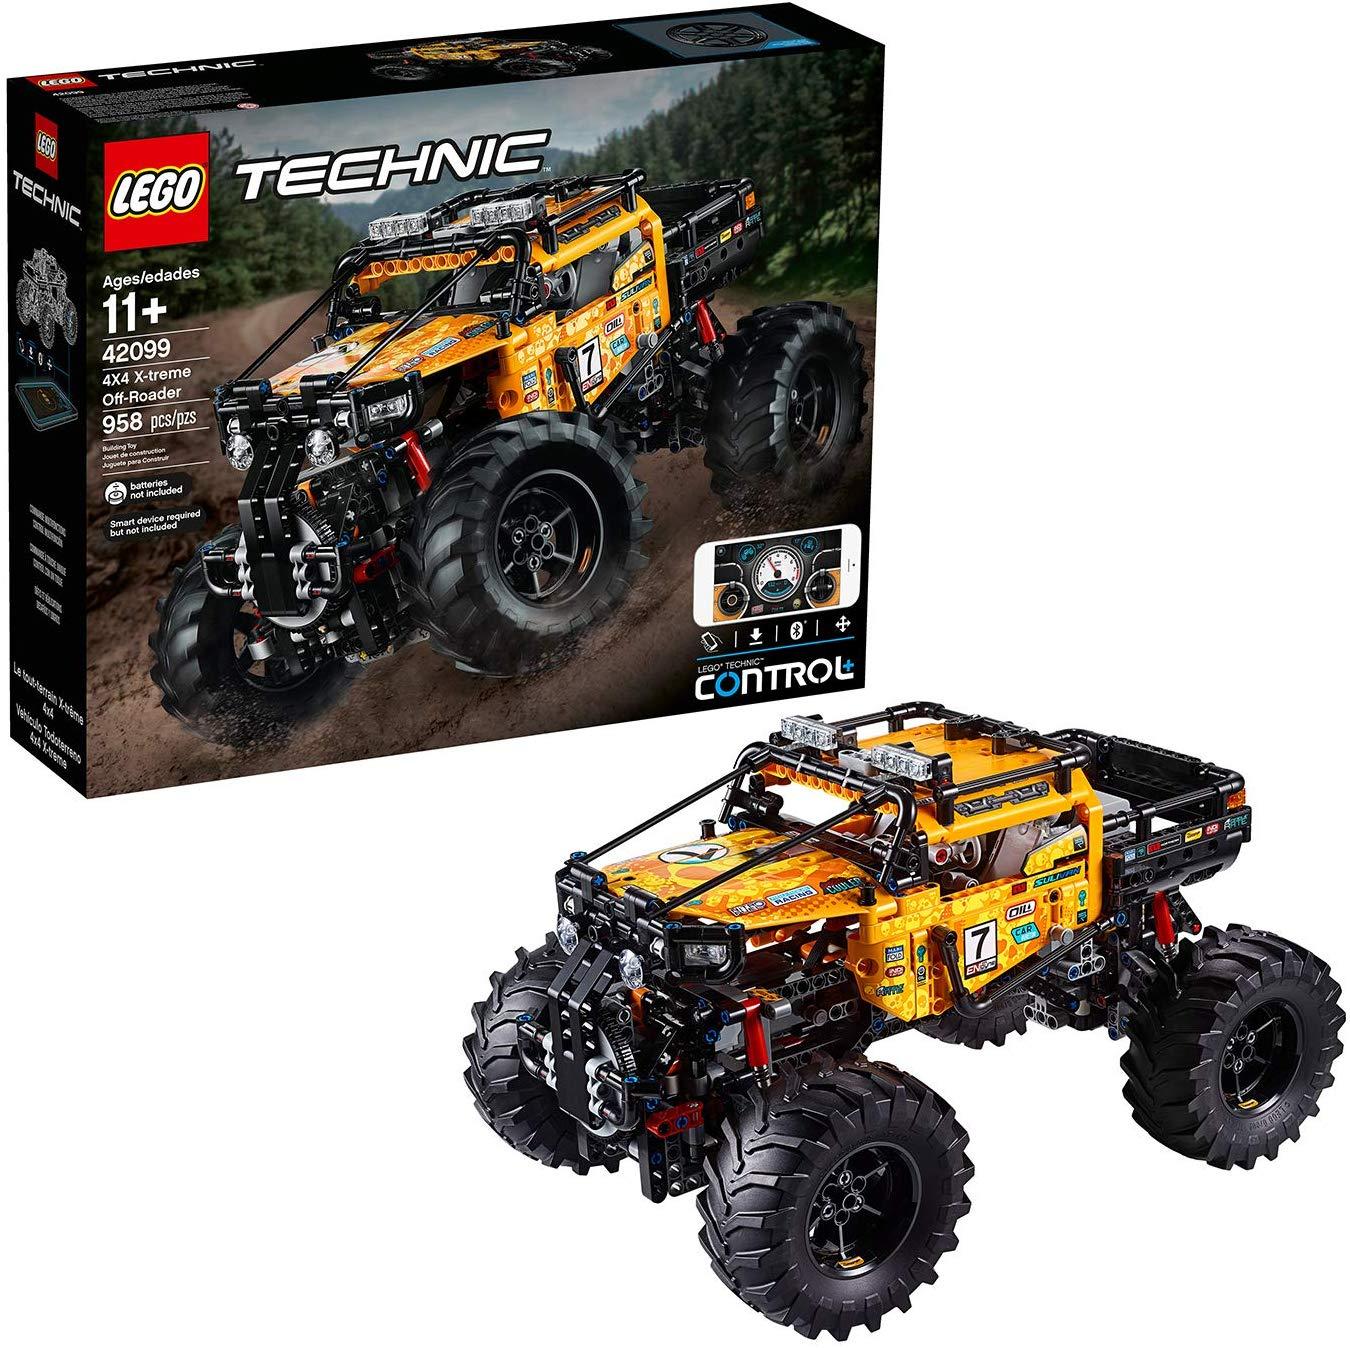 LEGO 42099 Technic Control+ 4x4 X-treme Off-Roader Truck App Controlled Construction Set - £145 @ Amazon